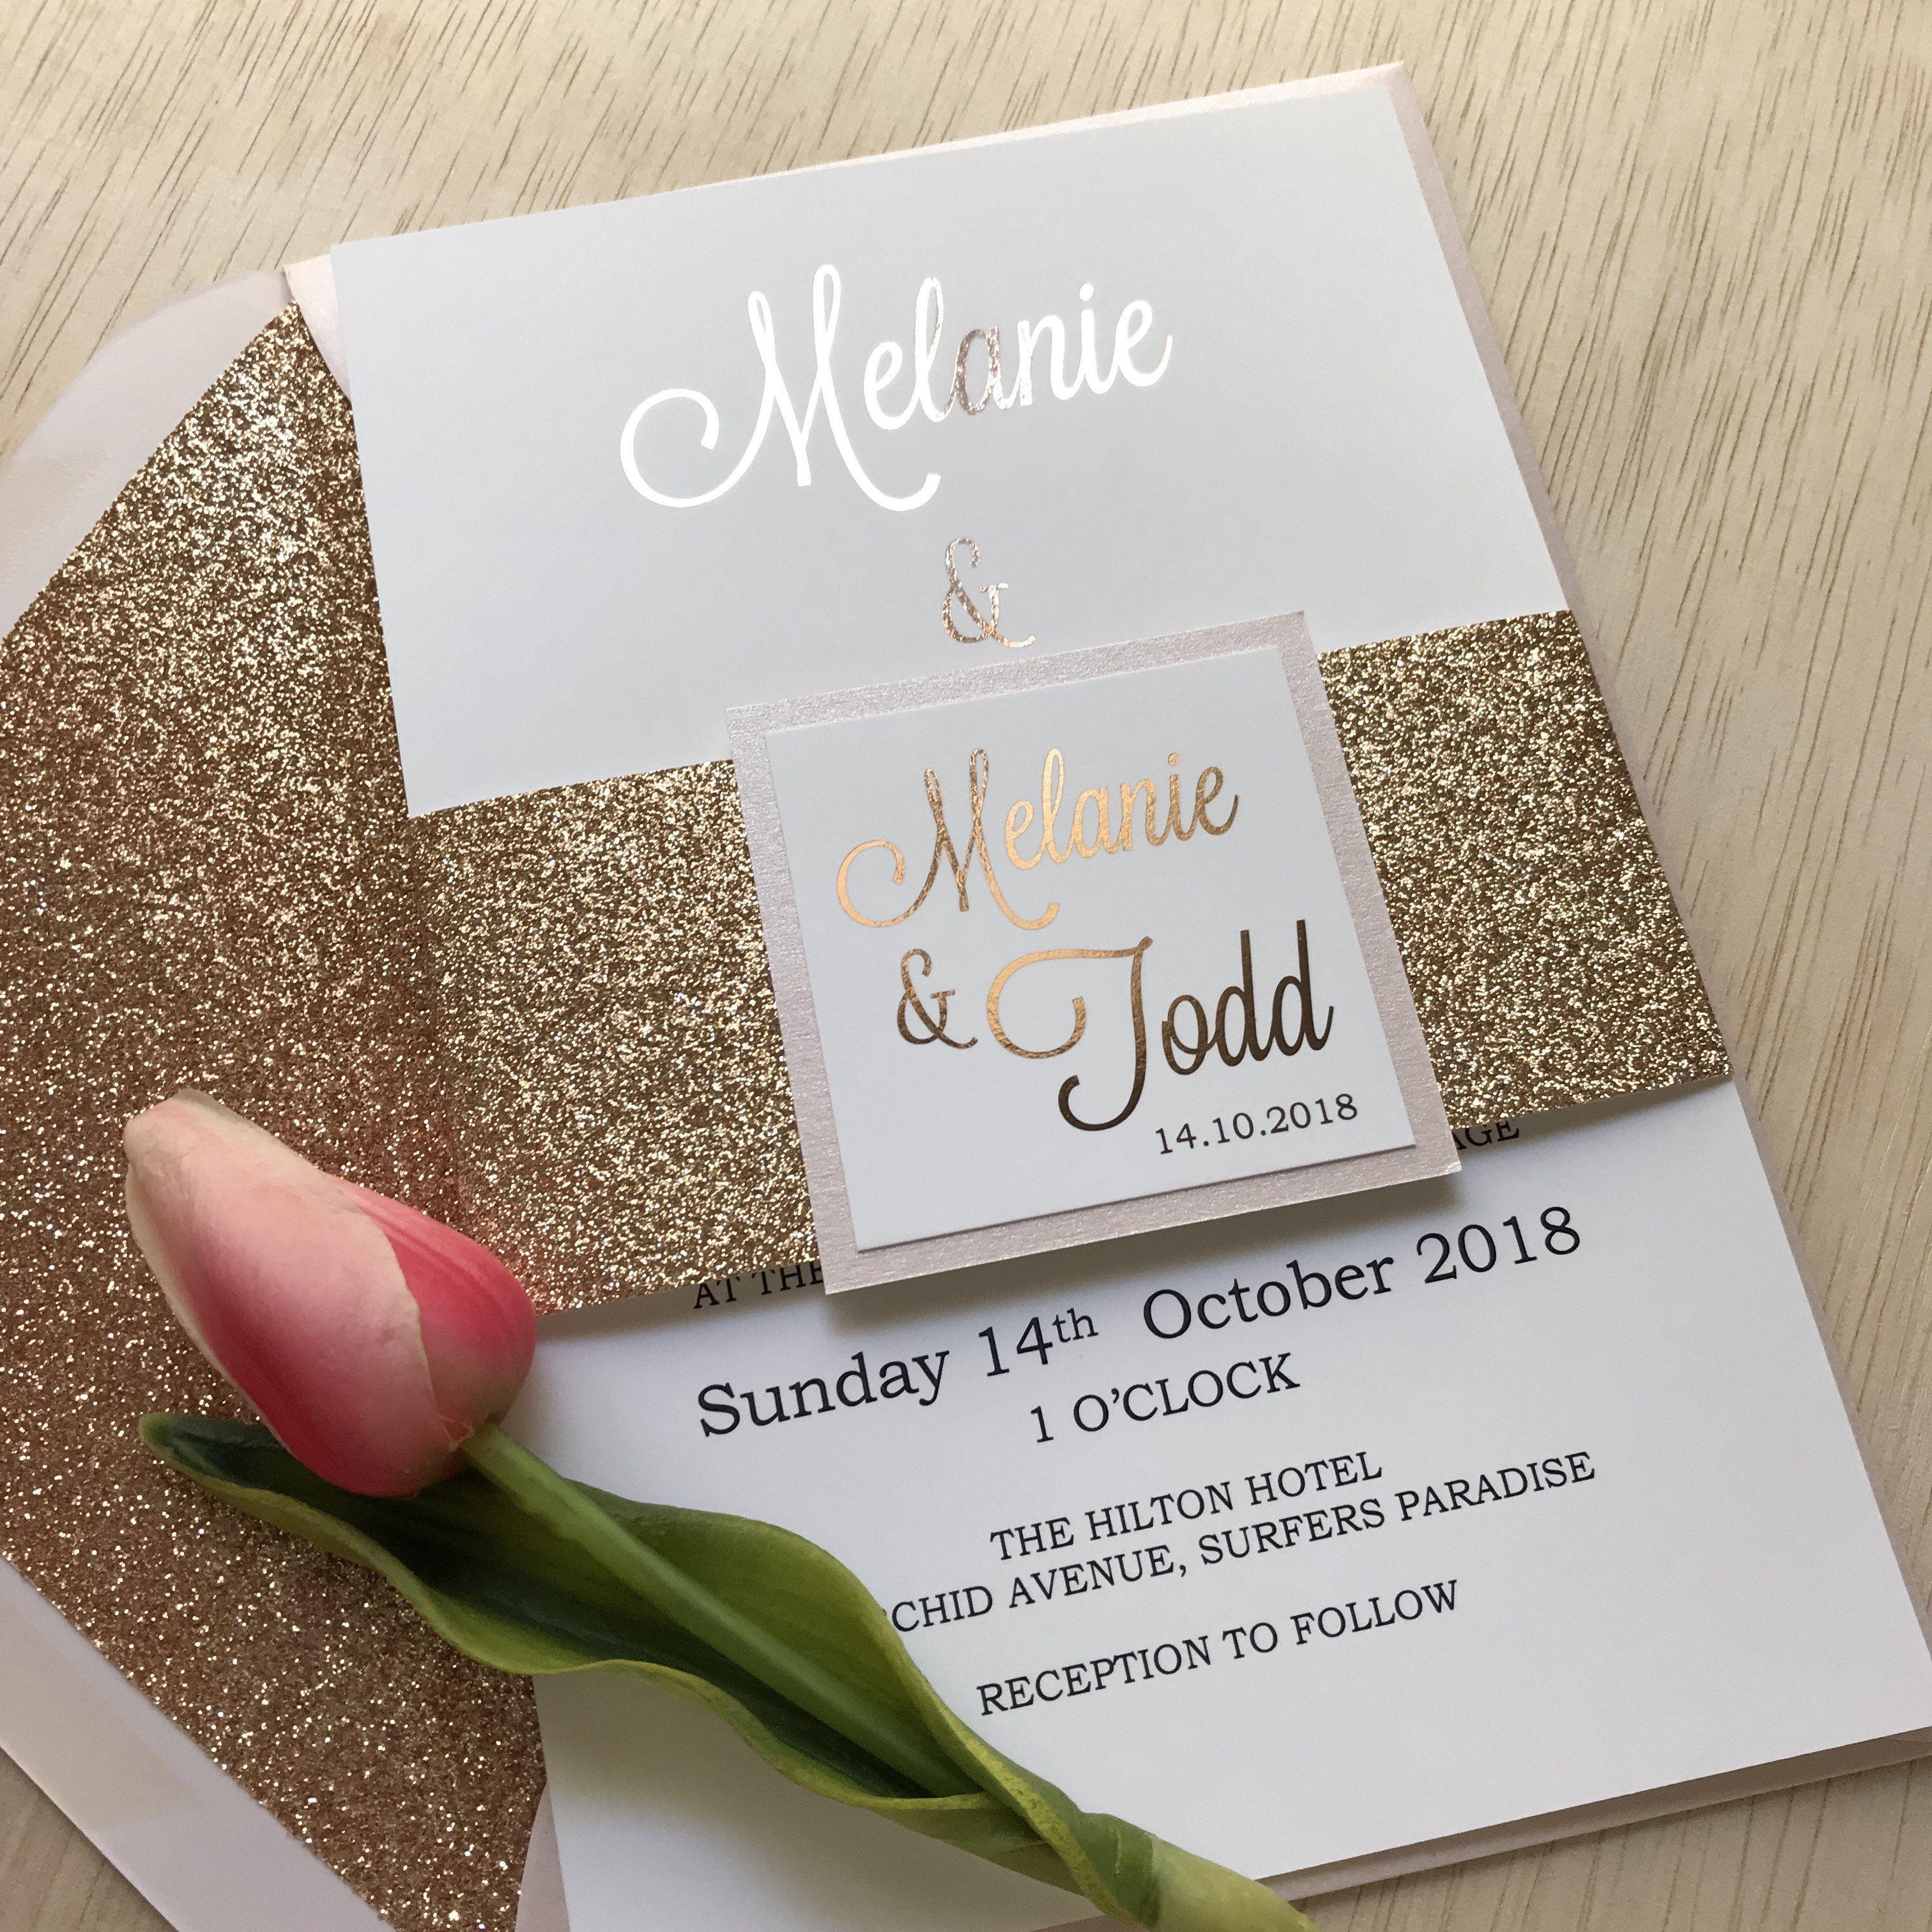 Wedding decorations using tulle october 2018 Dusky Rose Design  Wedding Ideas  Pinterest  Belly bands Wedding